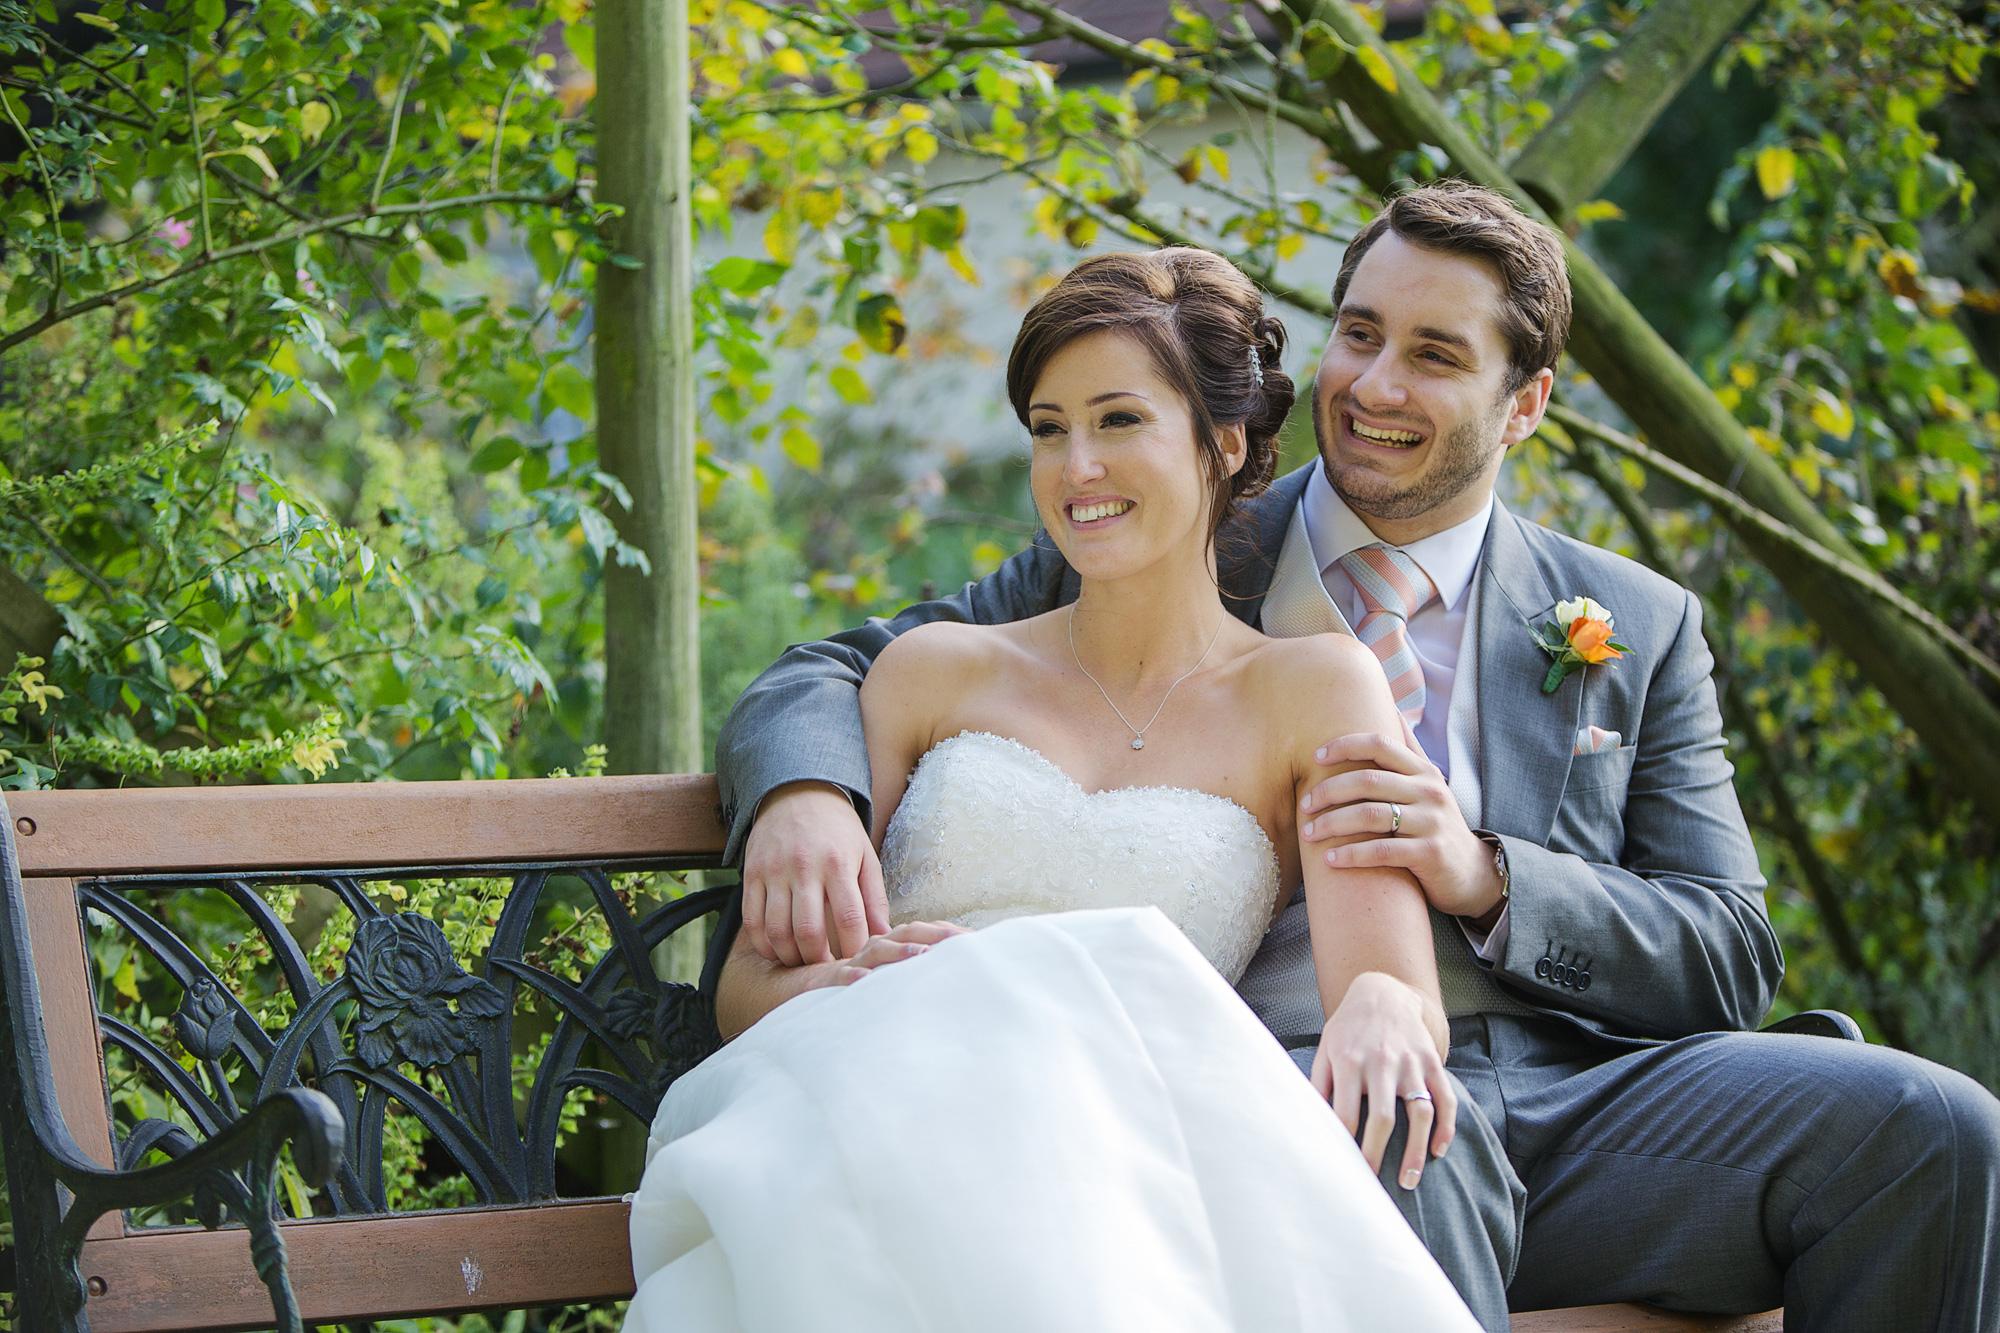 Adam_Hillier_Wedding_Photographer_Newbury_Berkshire_6 (7).jpg